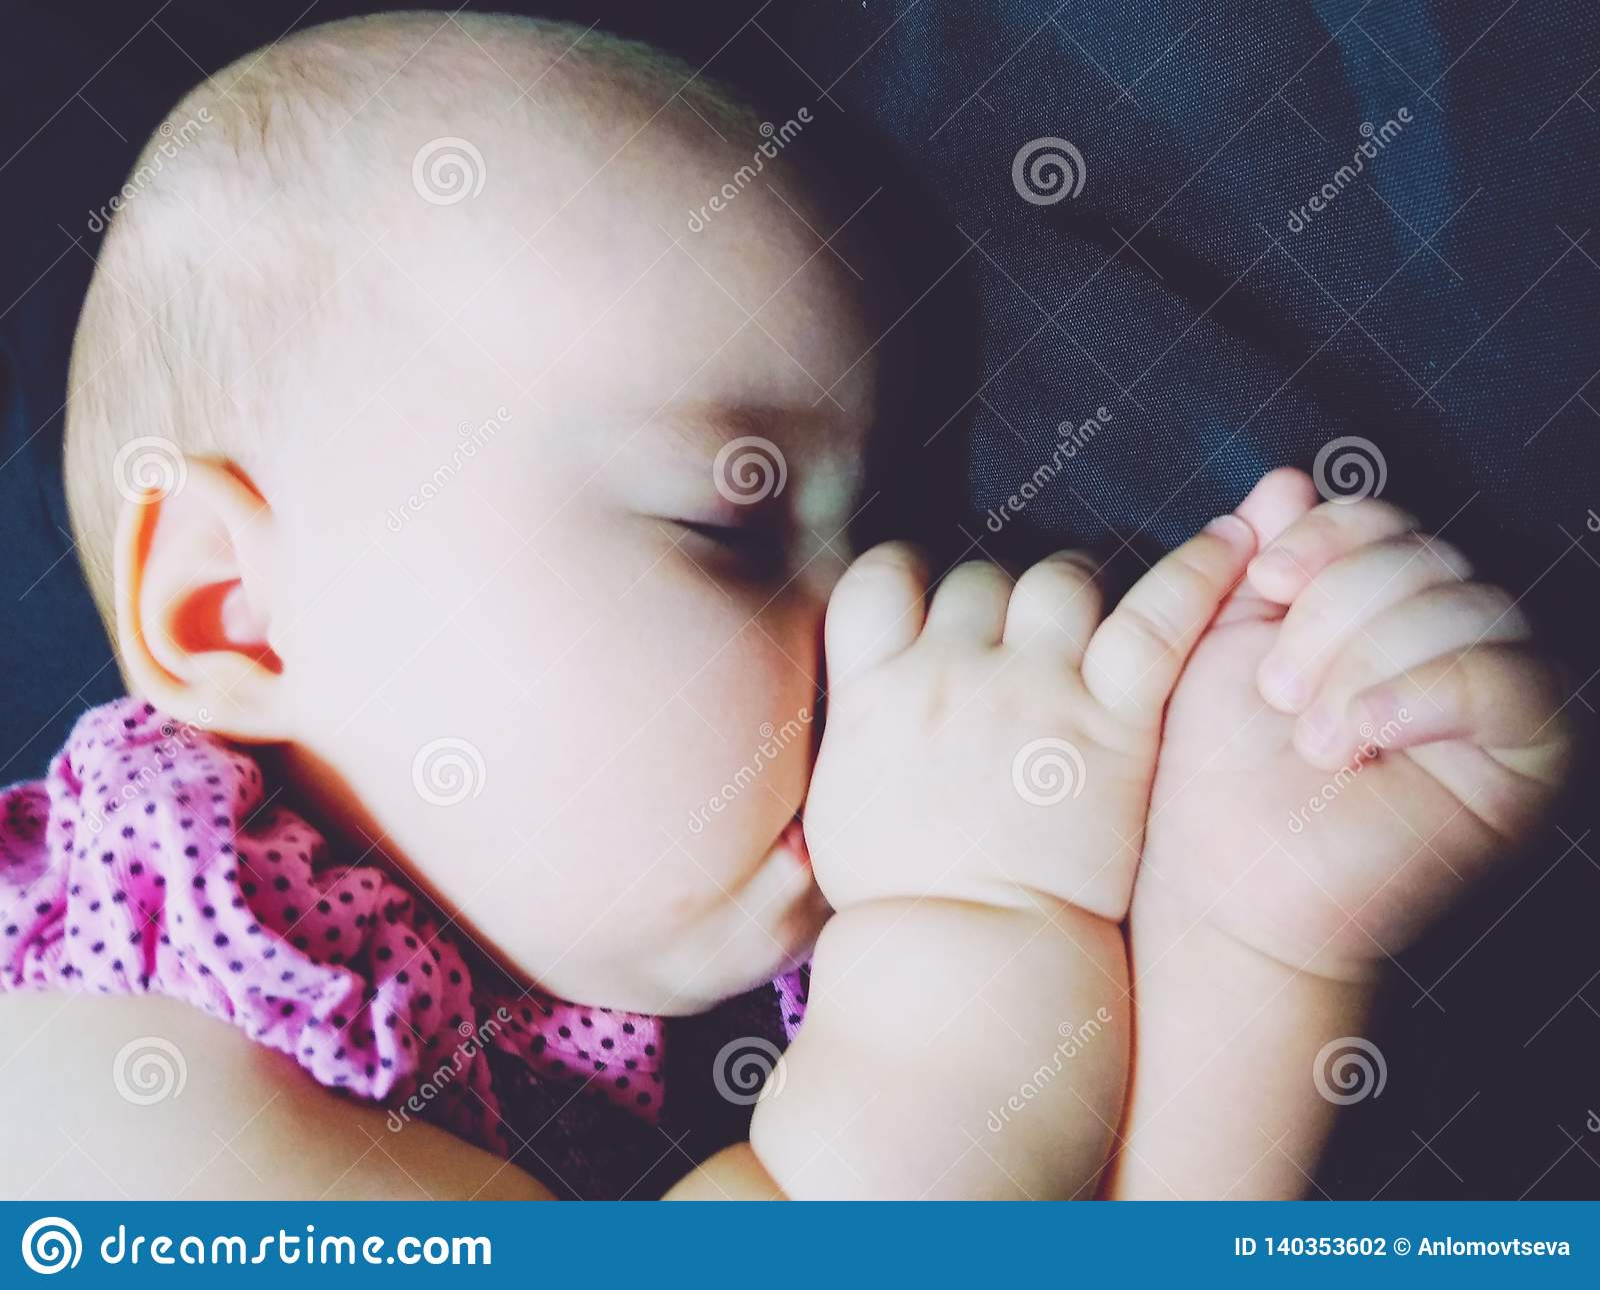 The baby sucks a thumb in a sleep